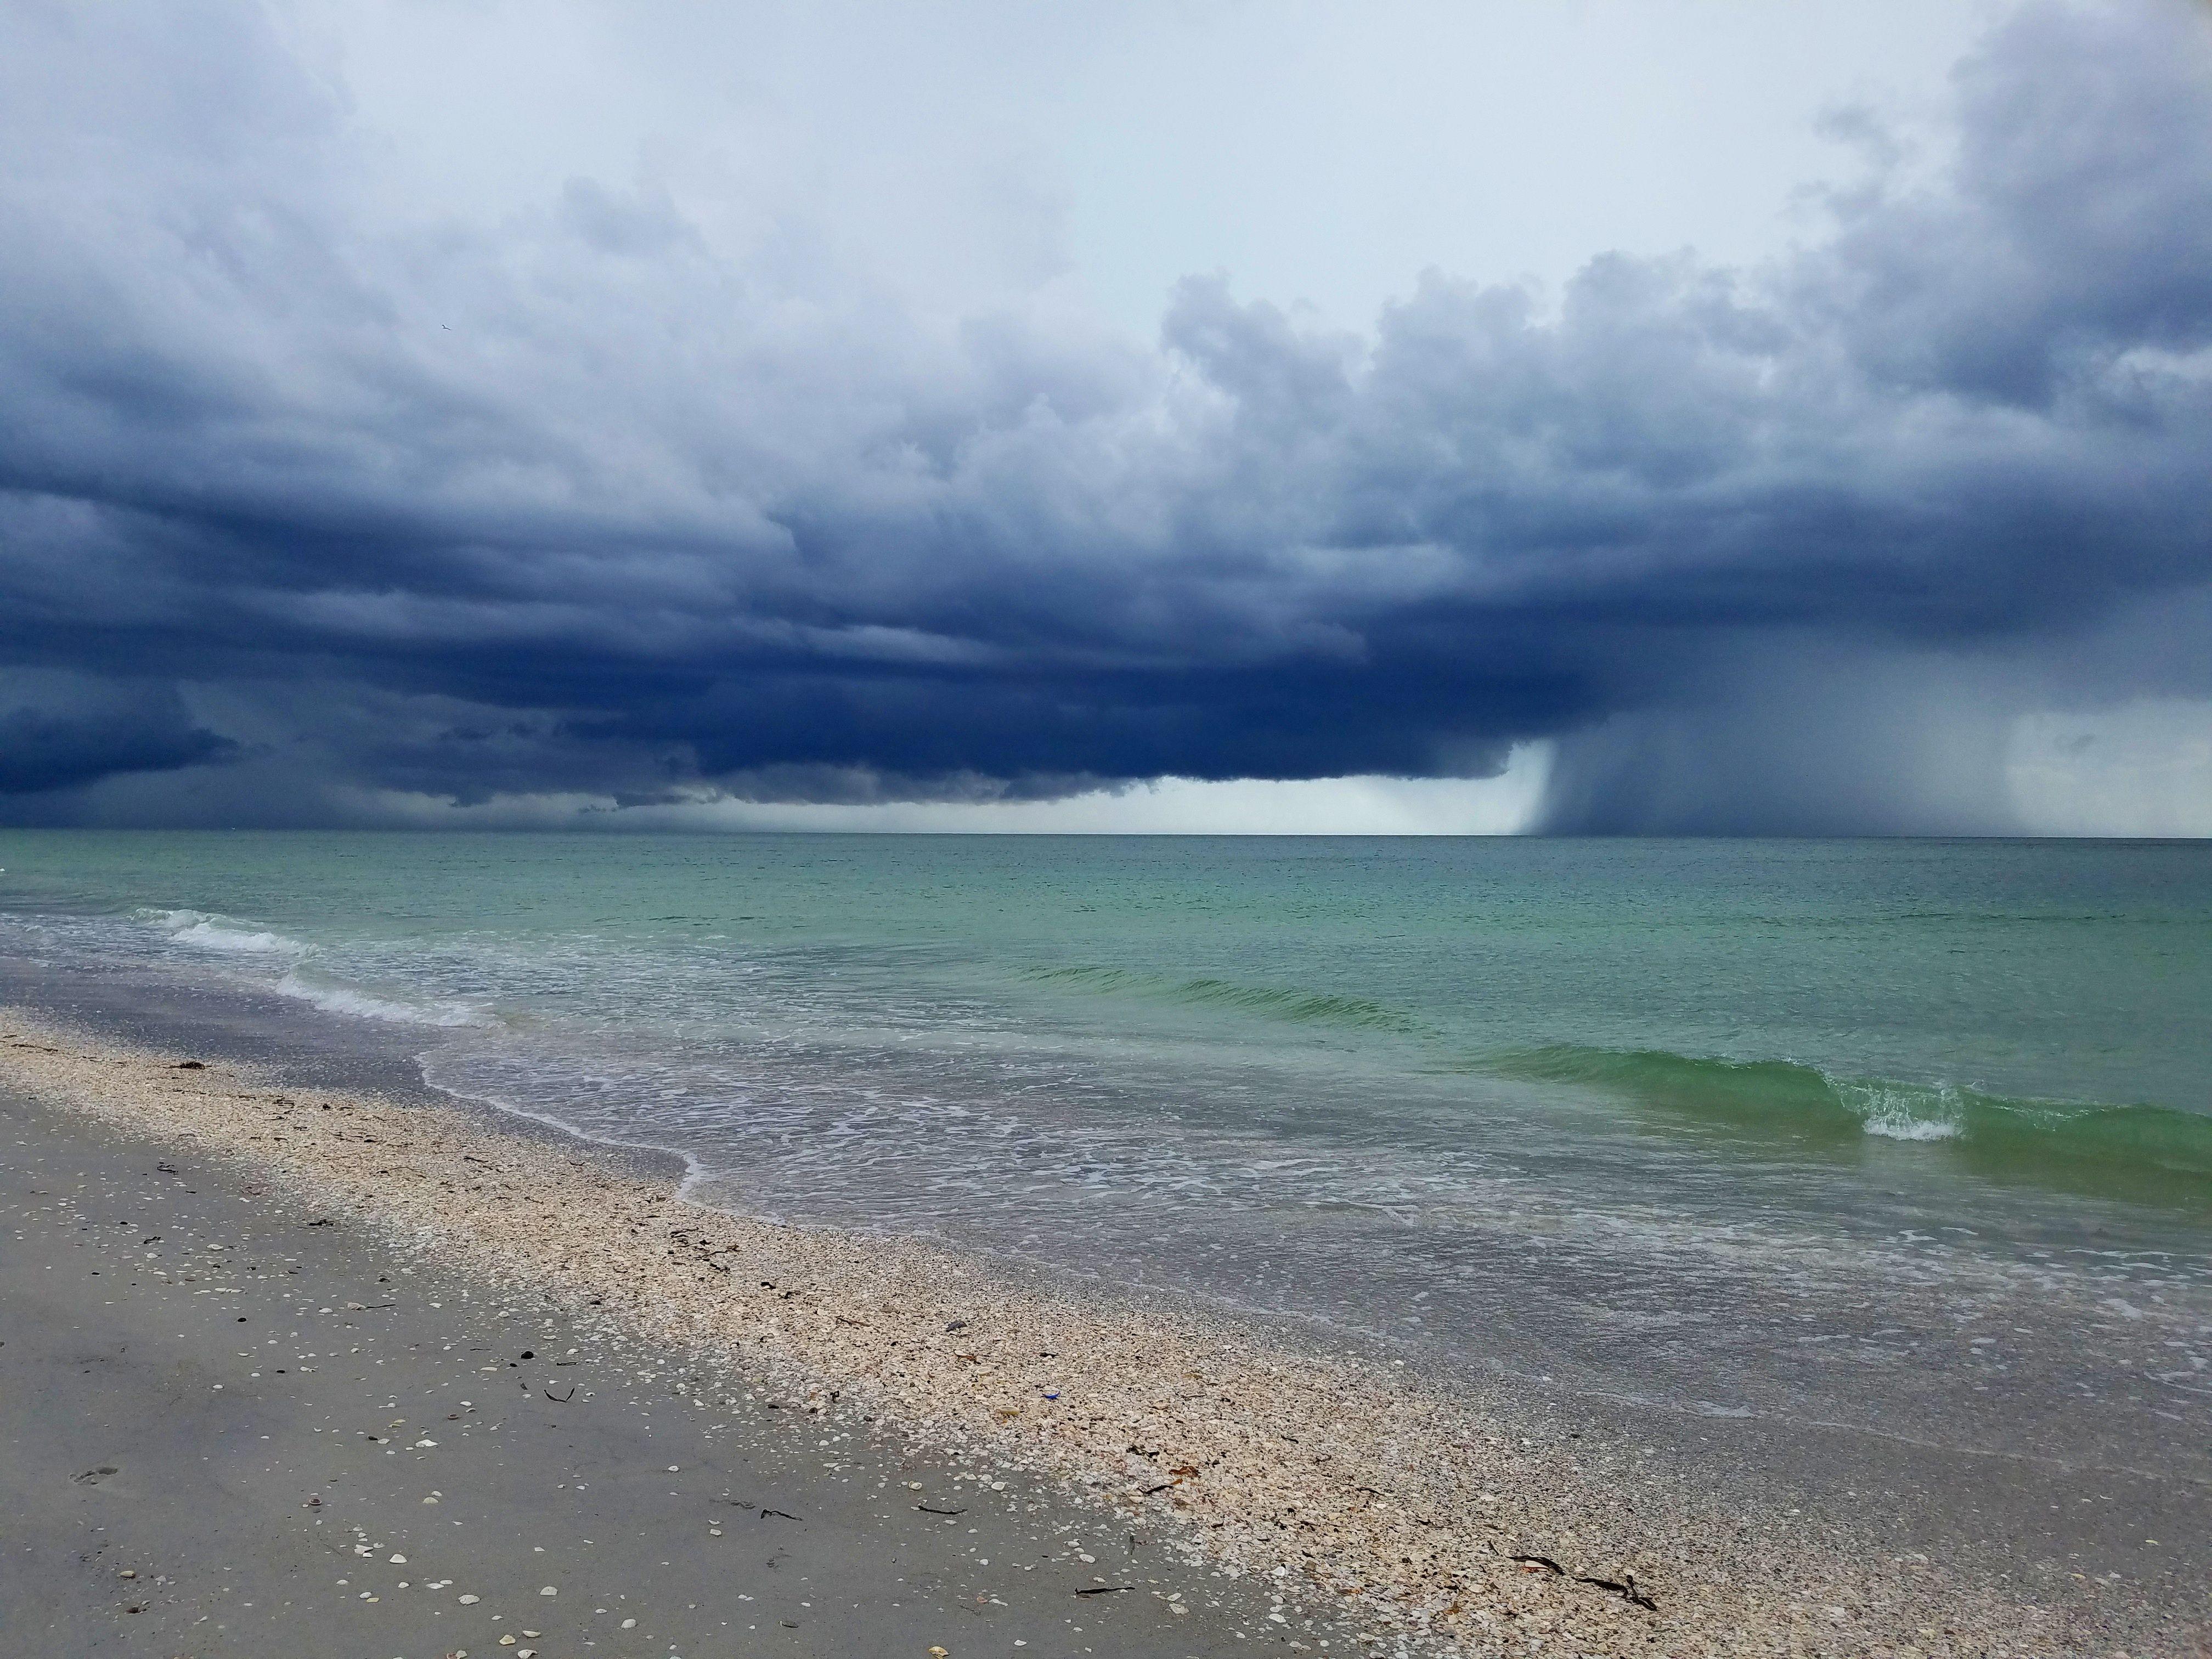 Rain or shine, a walk on the beach is always welcome ...